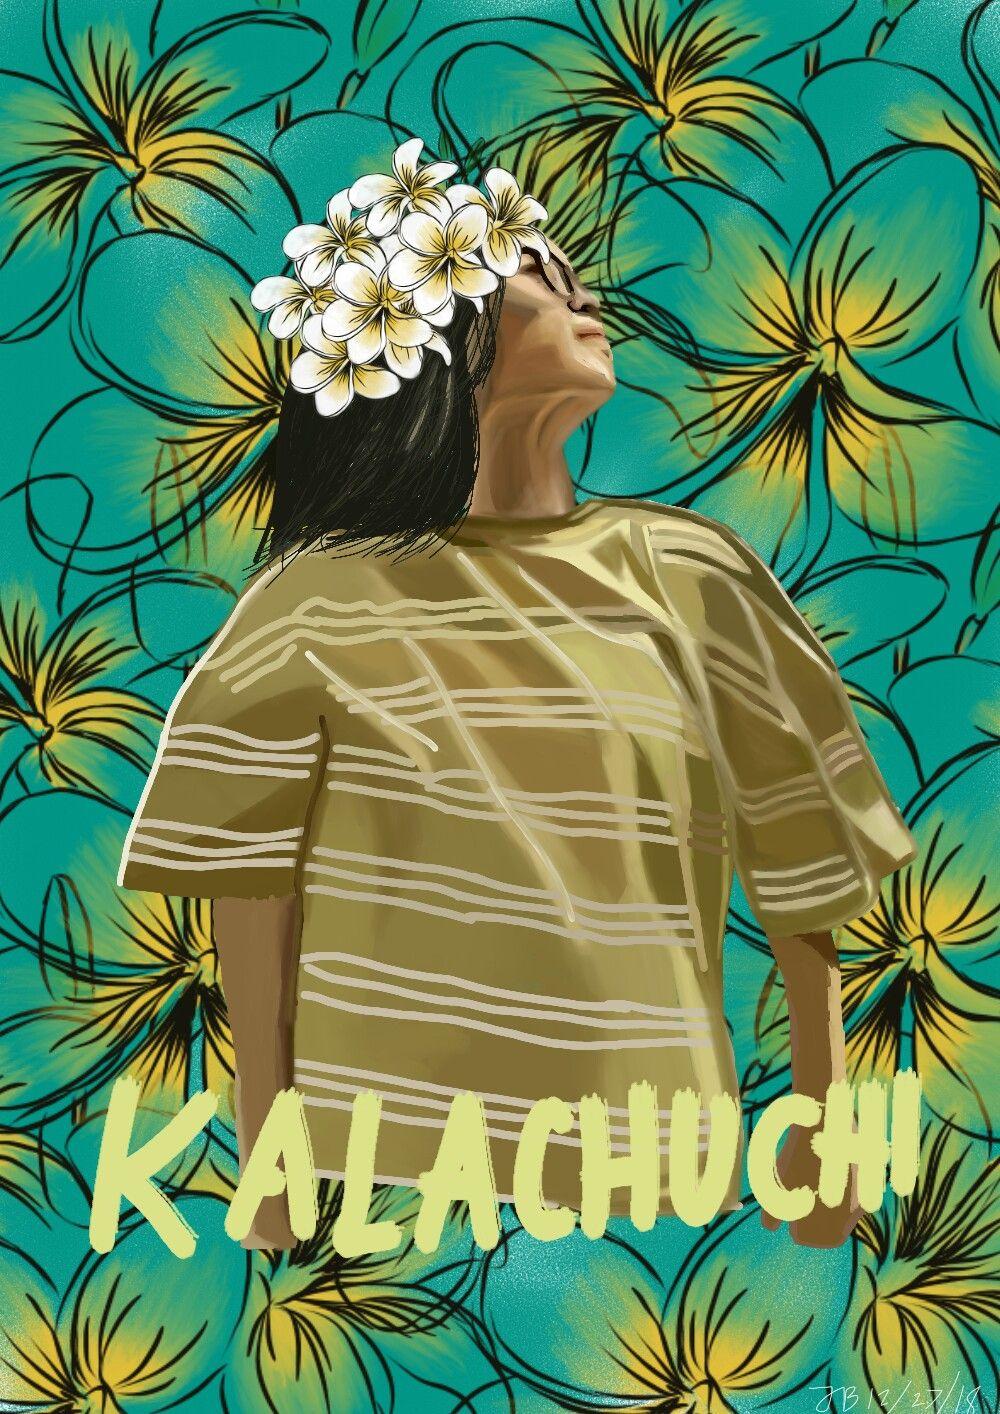 Kalachuchi - Munimuni | Art in 2019 | Filipino art, Art, Artist